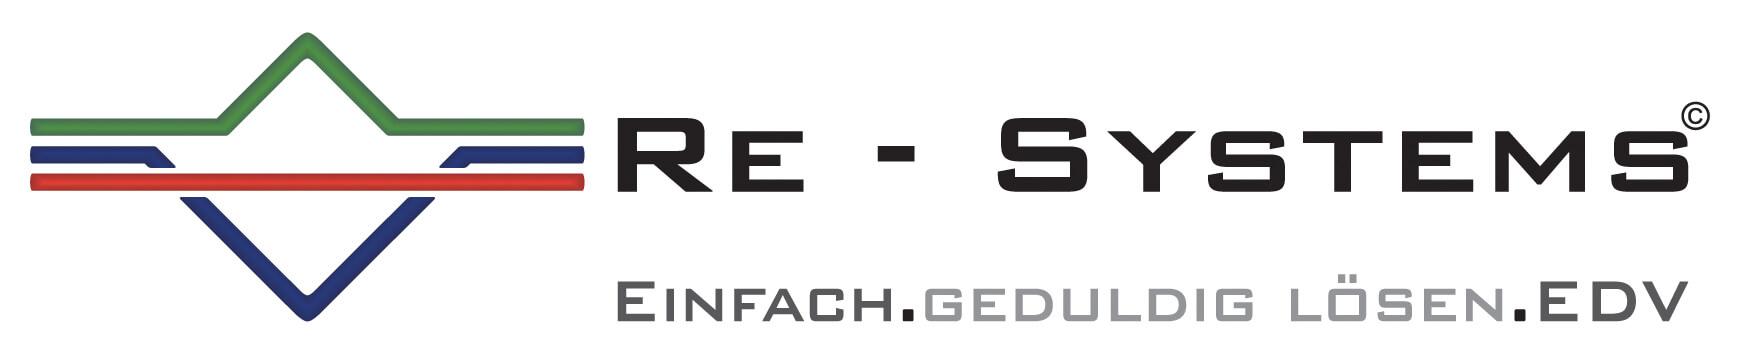 Re-Systems: EDV-Betreuung Innsbruck